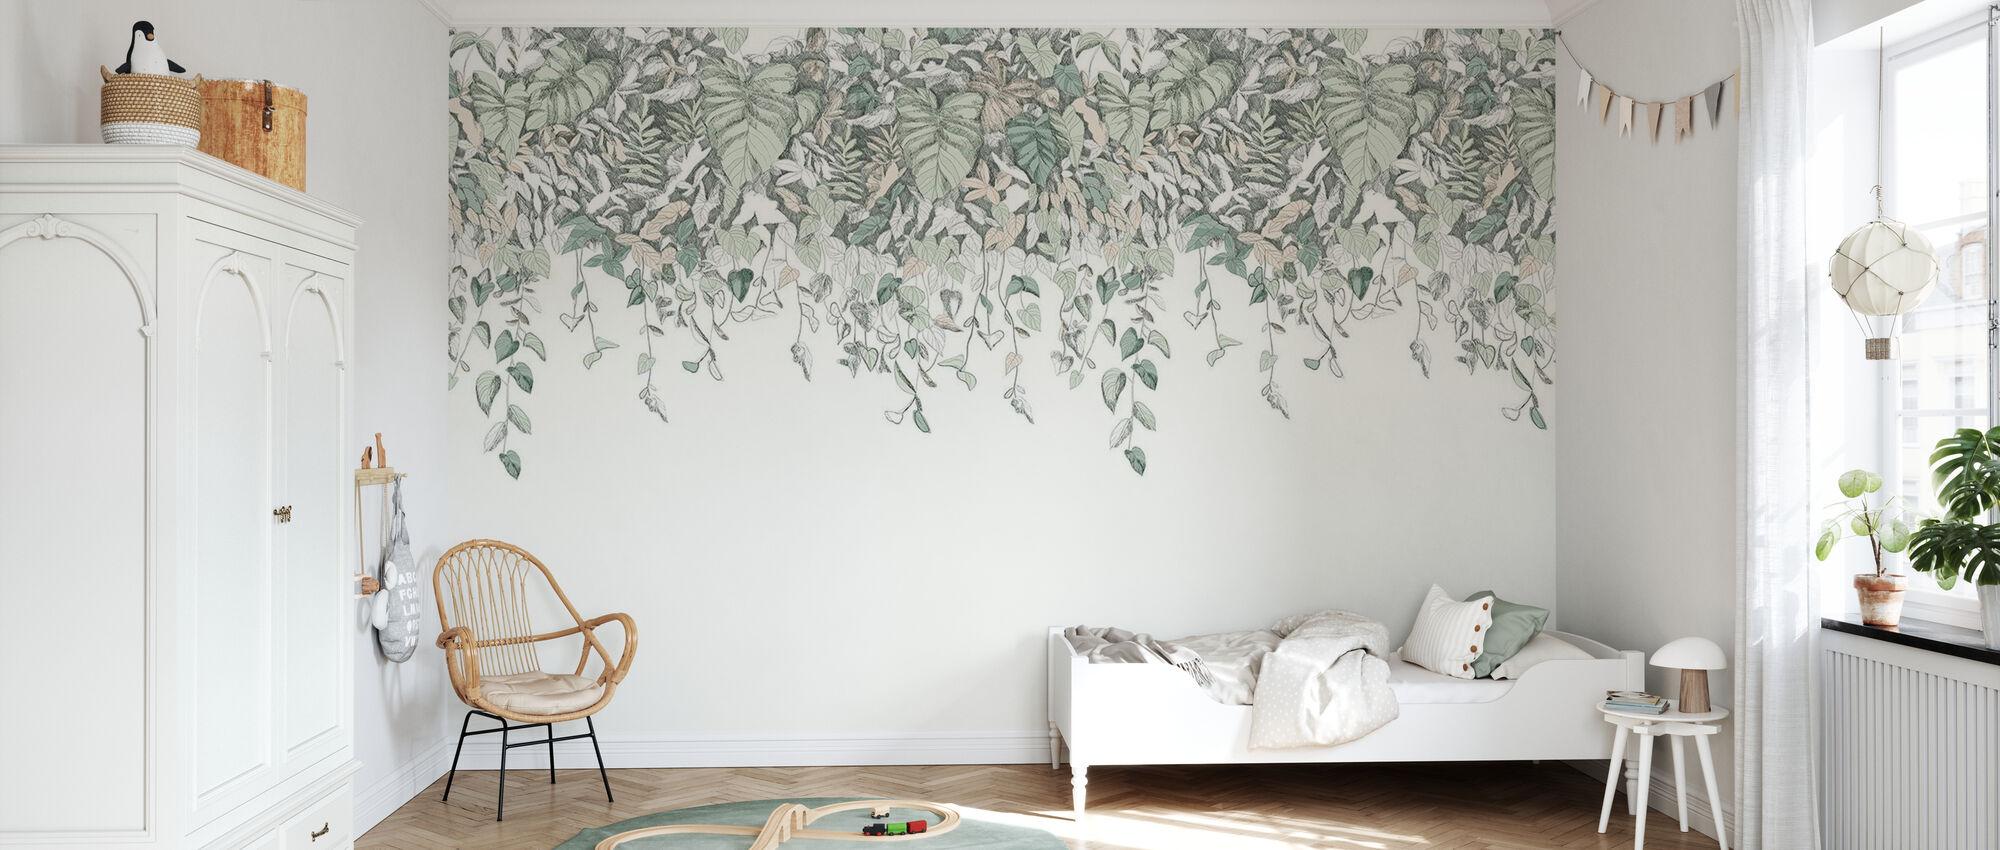 Secret Garden Upside Down - Green - Wallpaper - Kids Room